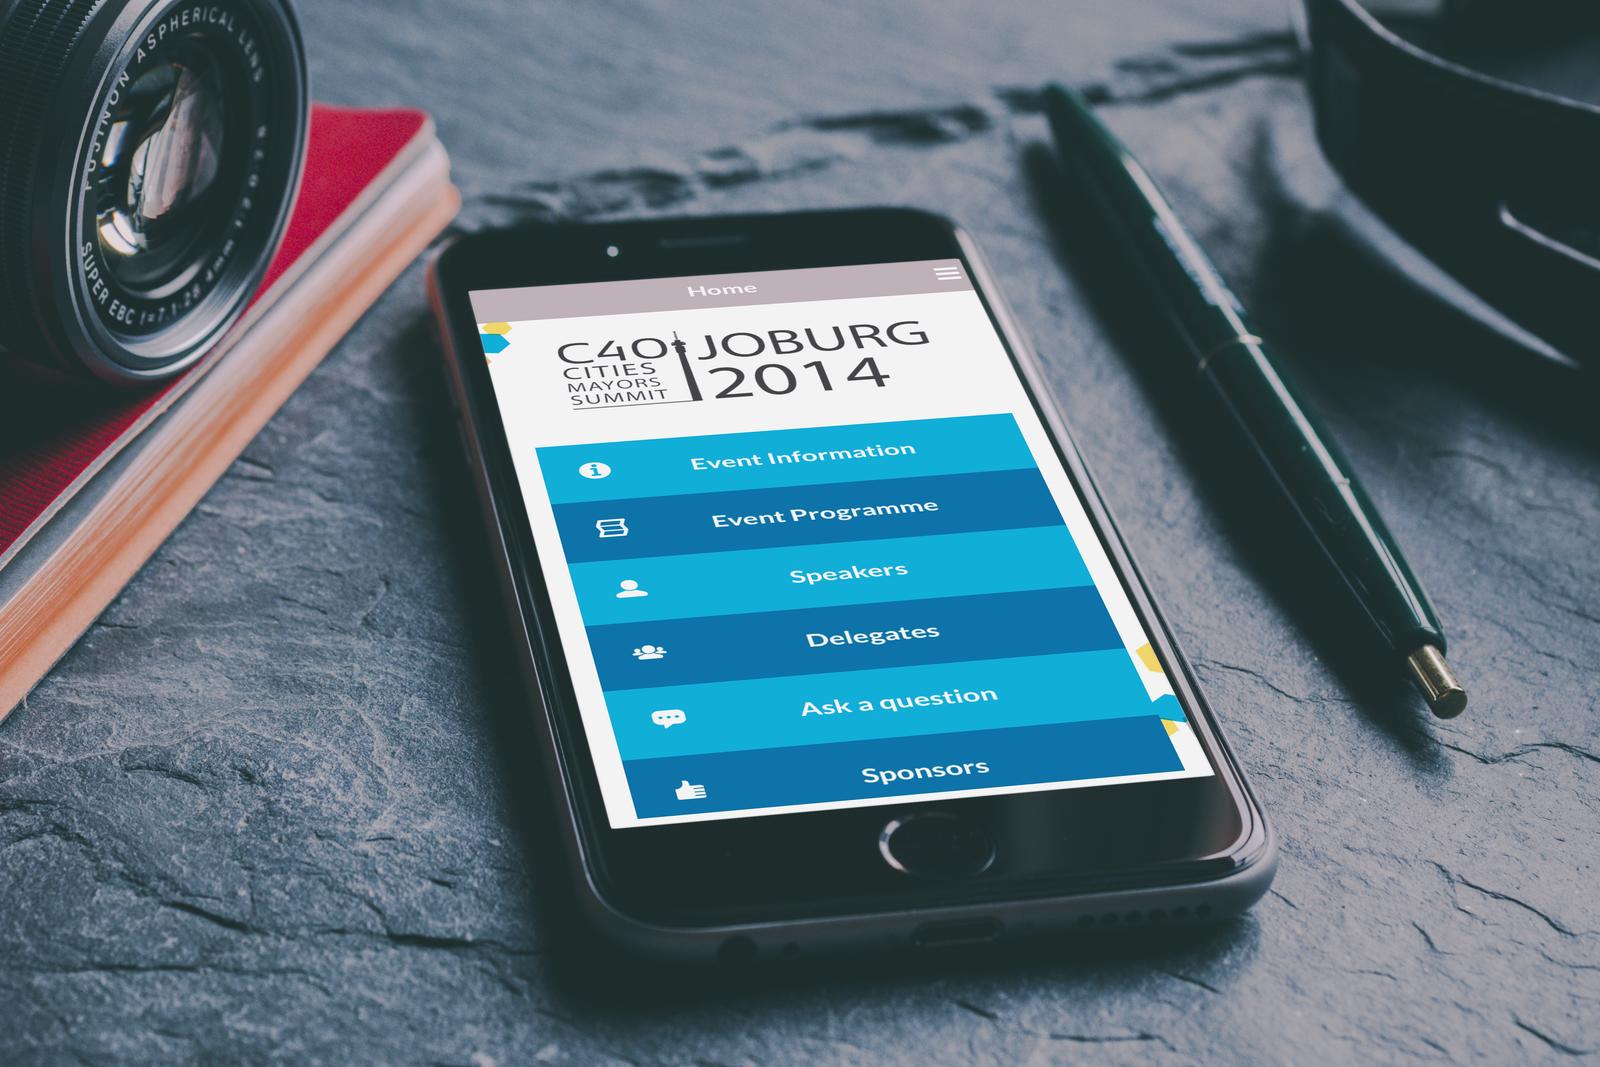 C40 Cities mayors summit Johannesburg 2014 mobile and web app